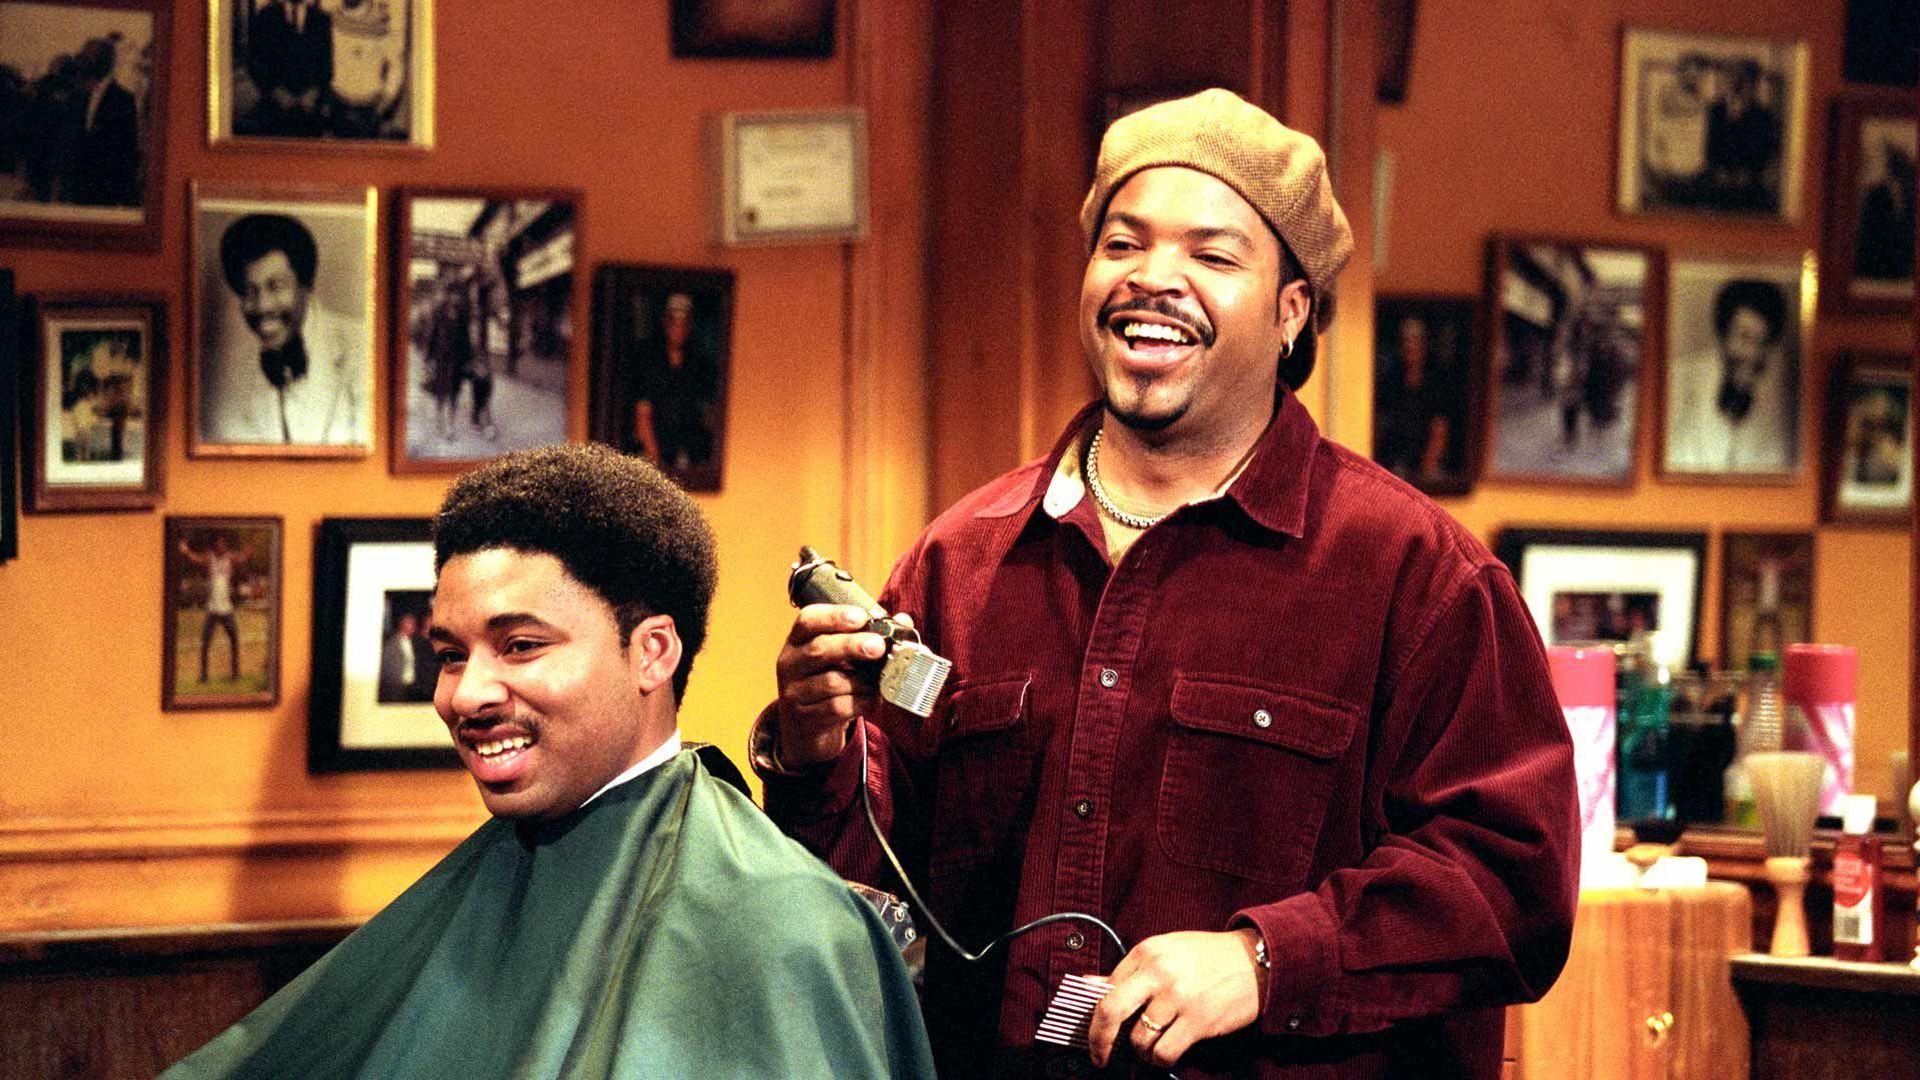 barbershop scene with ice cube